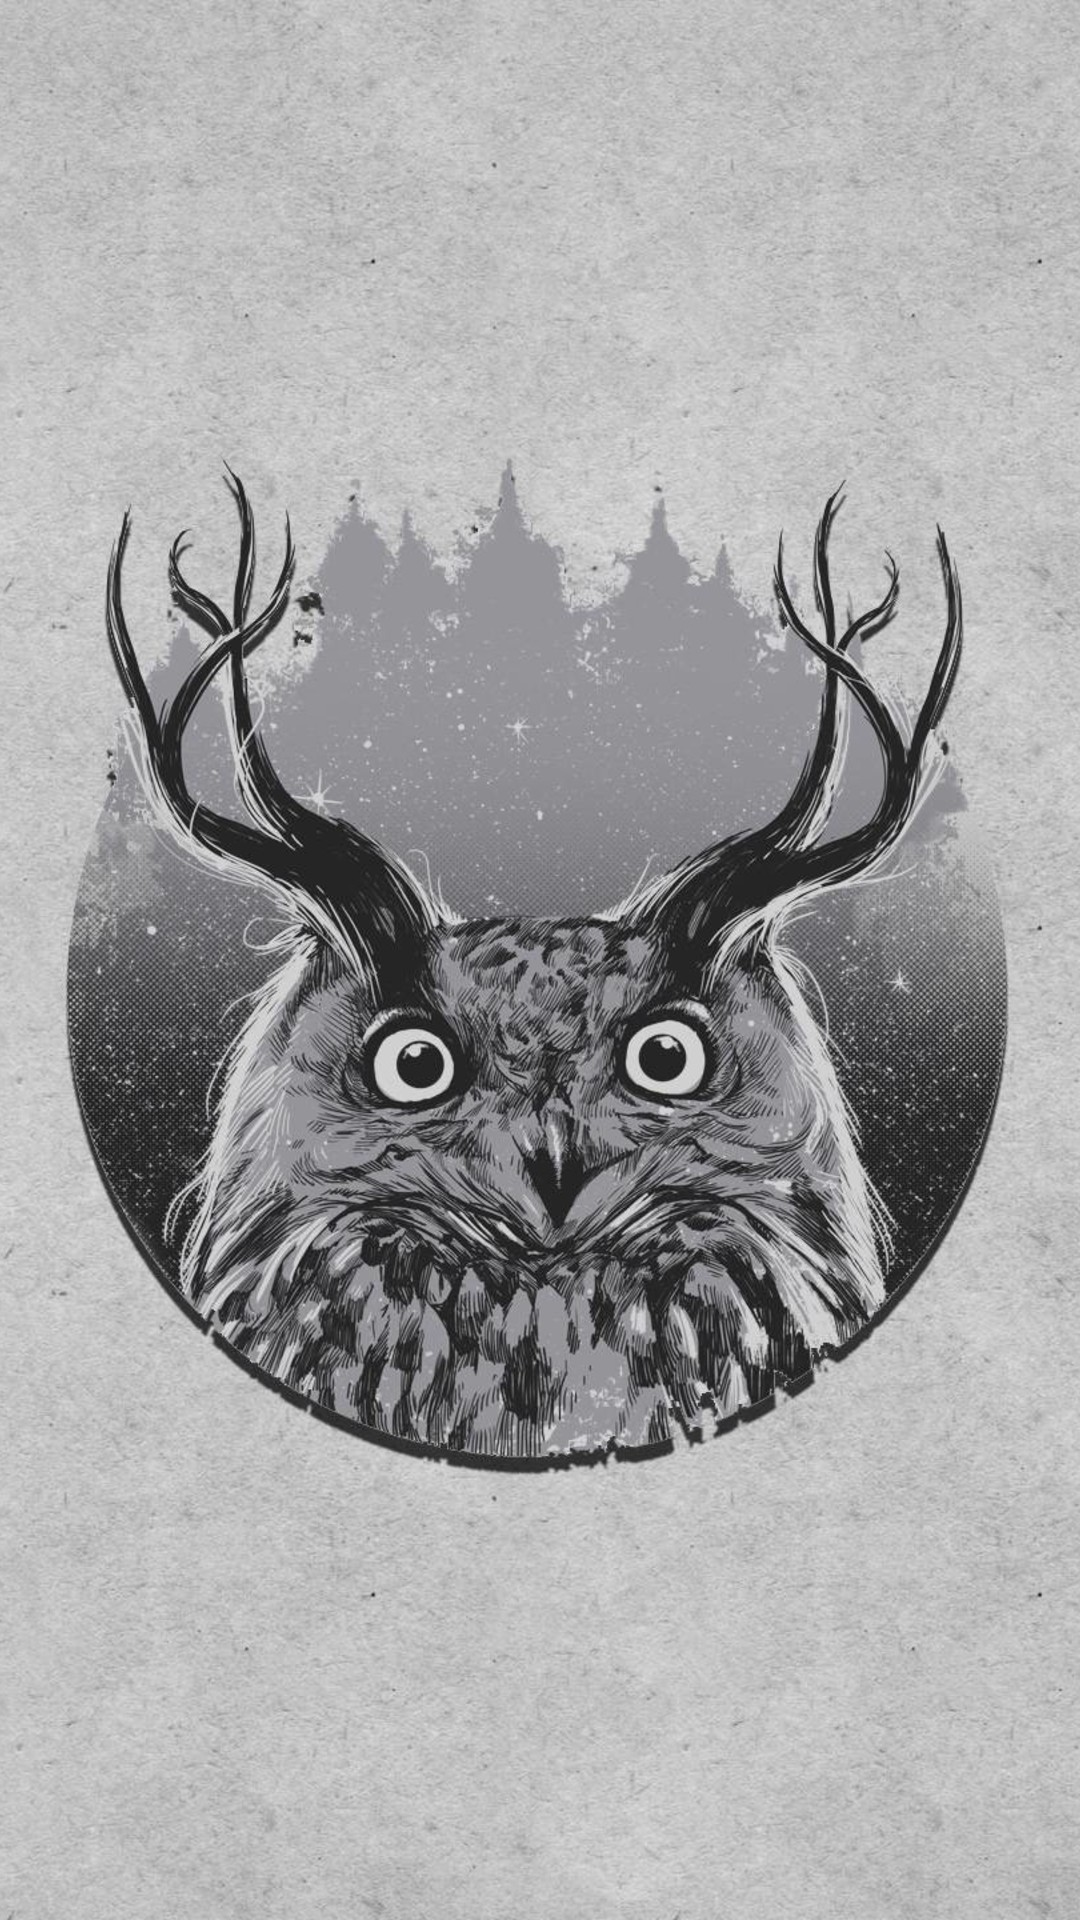 Cute Owl Iphone Wallpaper Hd Cute Owl Wallpaper For Android Pixelstalk Net